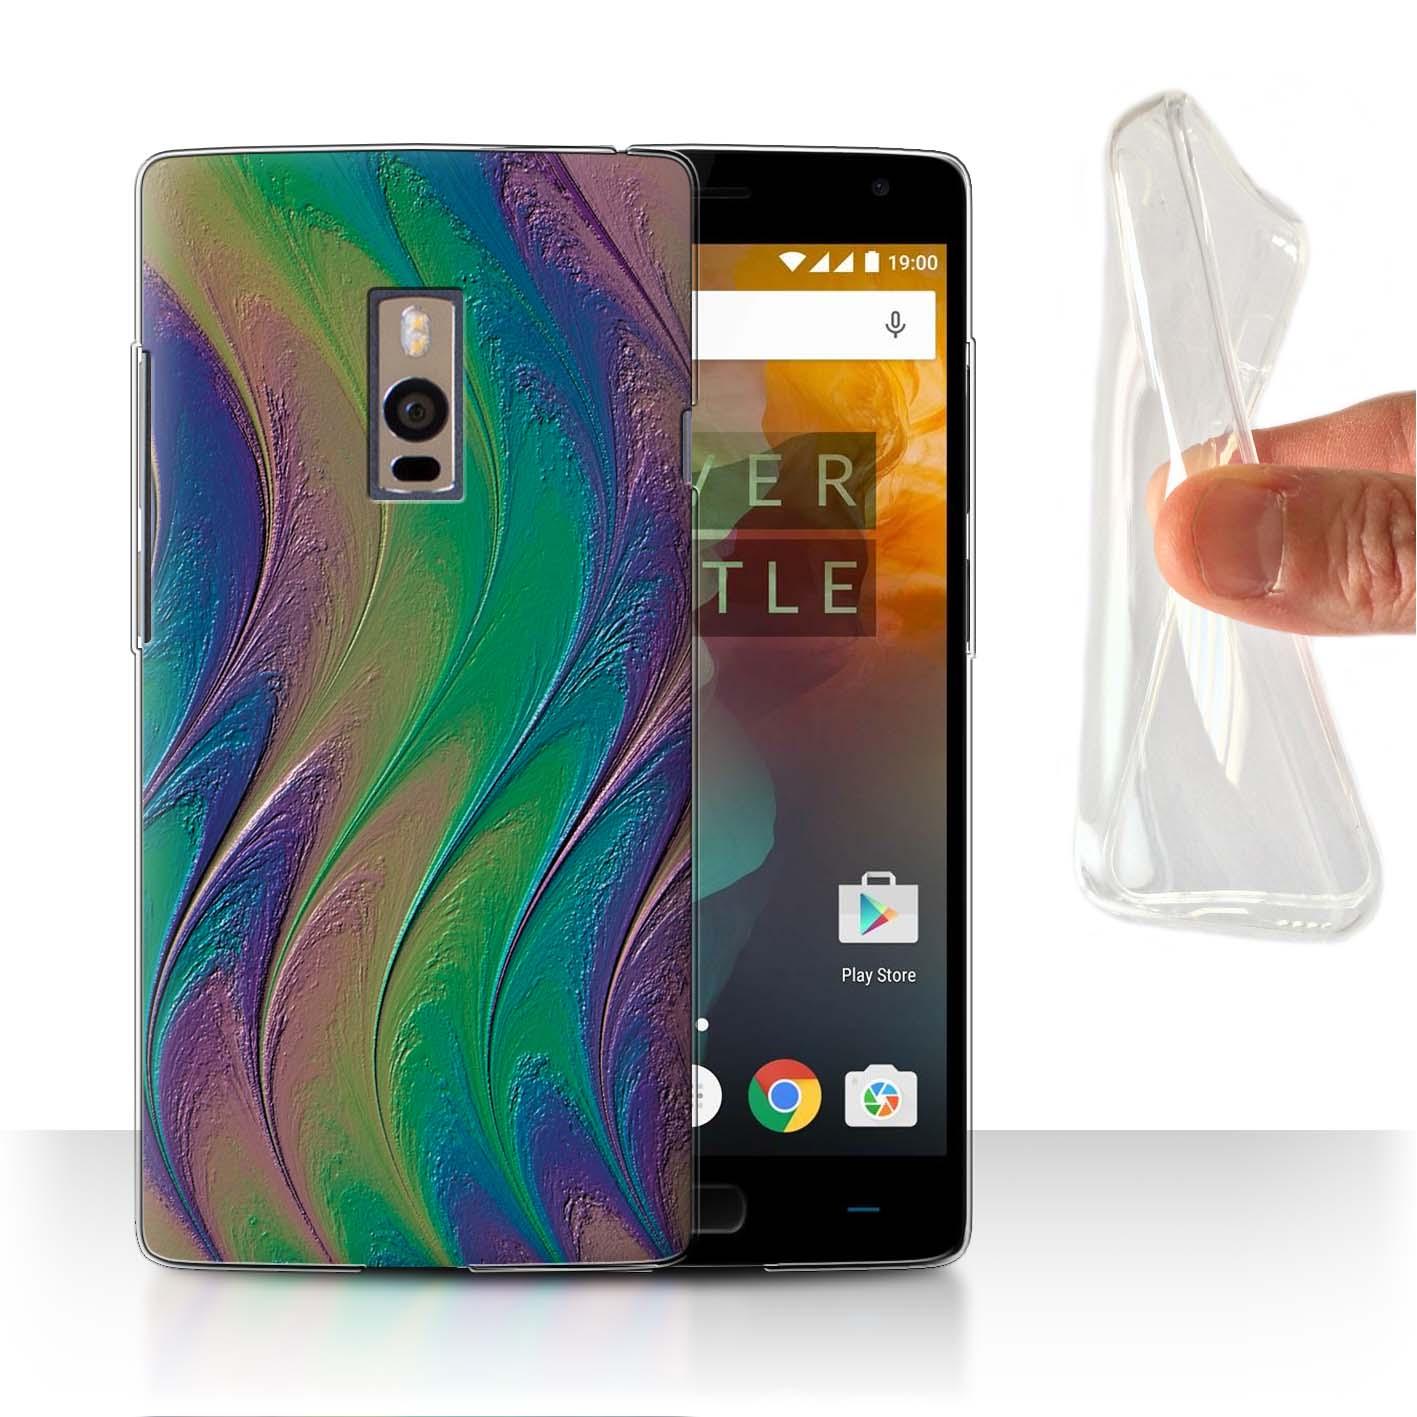 STUFF4-Gel-TPU-etui-de-telePhone-pour-Populaires-Dispositifs-Smartphone-Moderne